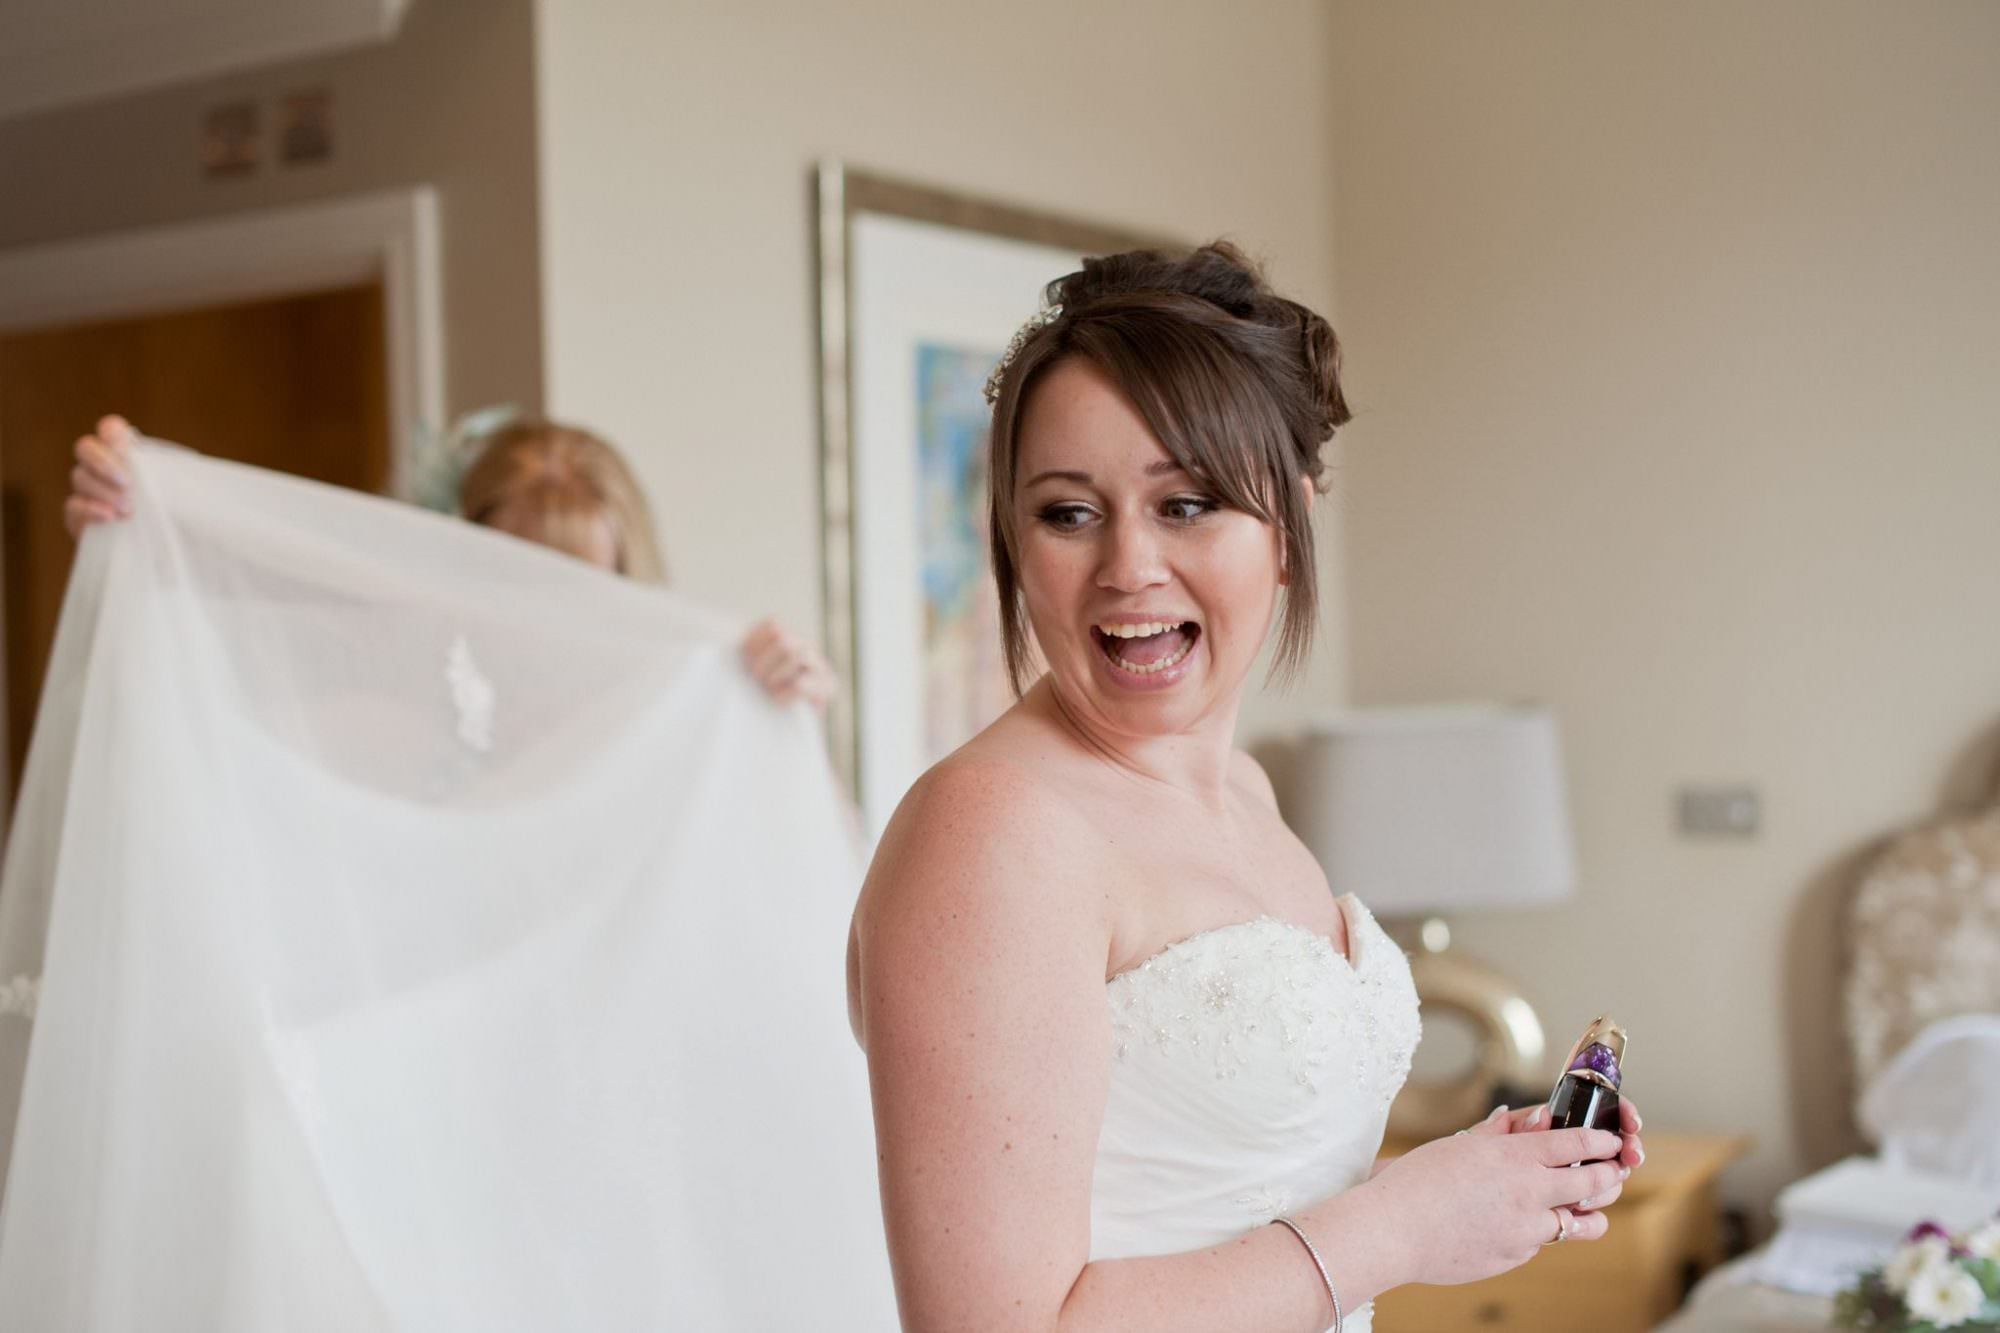 Bournemouth Bride in strapless wedding gown